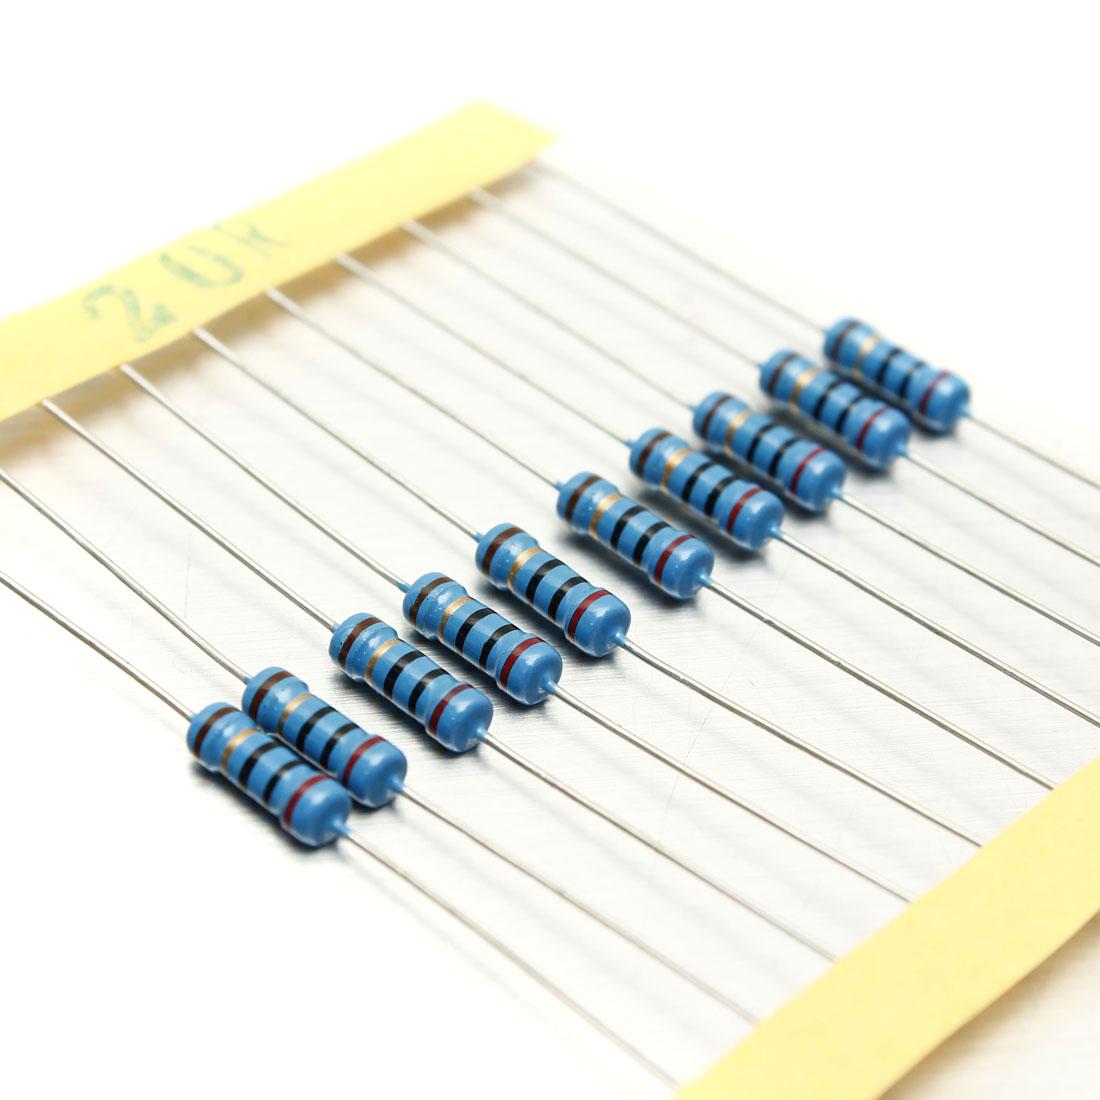 1000Pcs-50-Values-1-2W-0-5W-1-Metal-Film-Resistors-Kit-Assortment-Mix thumbnail 2